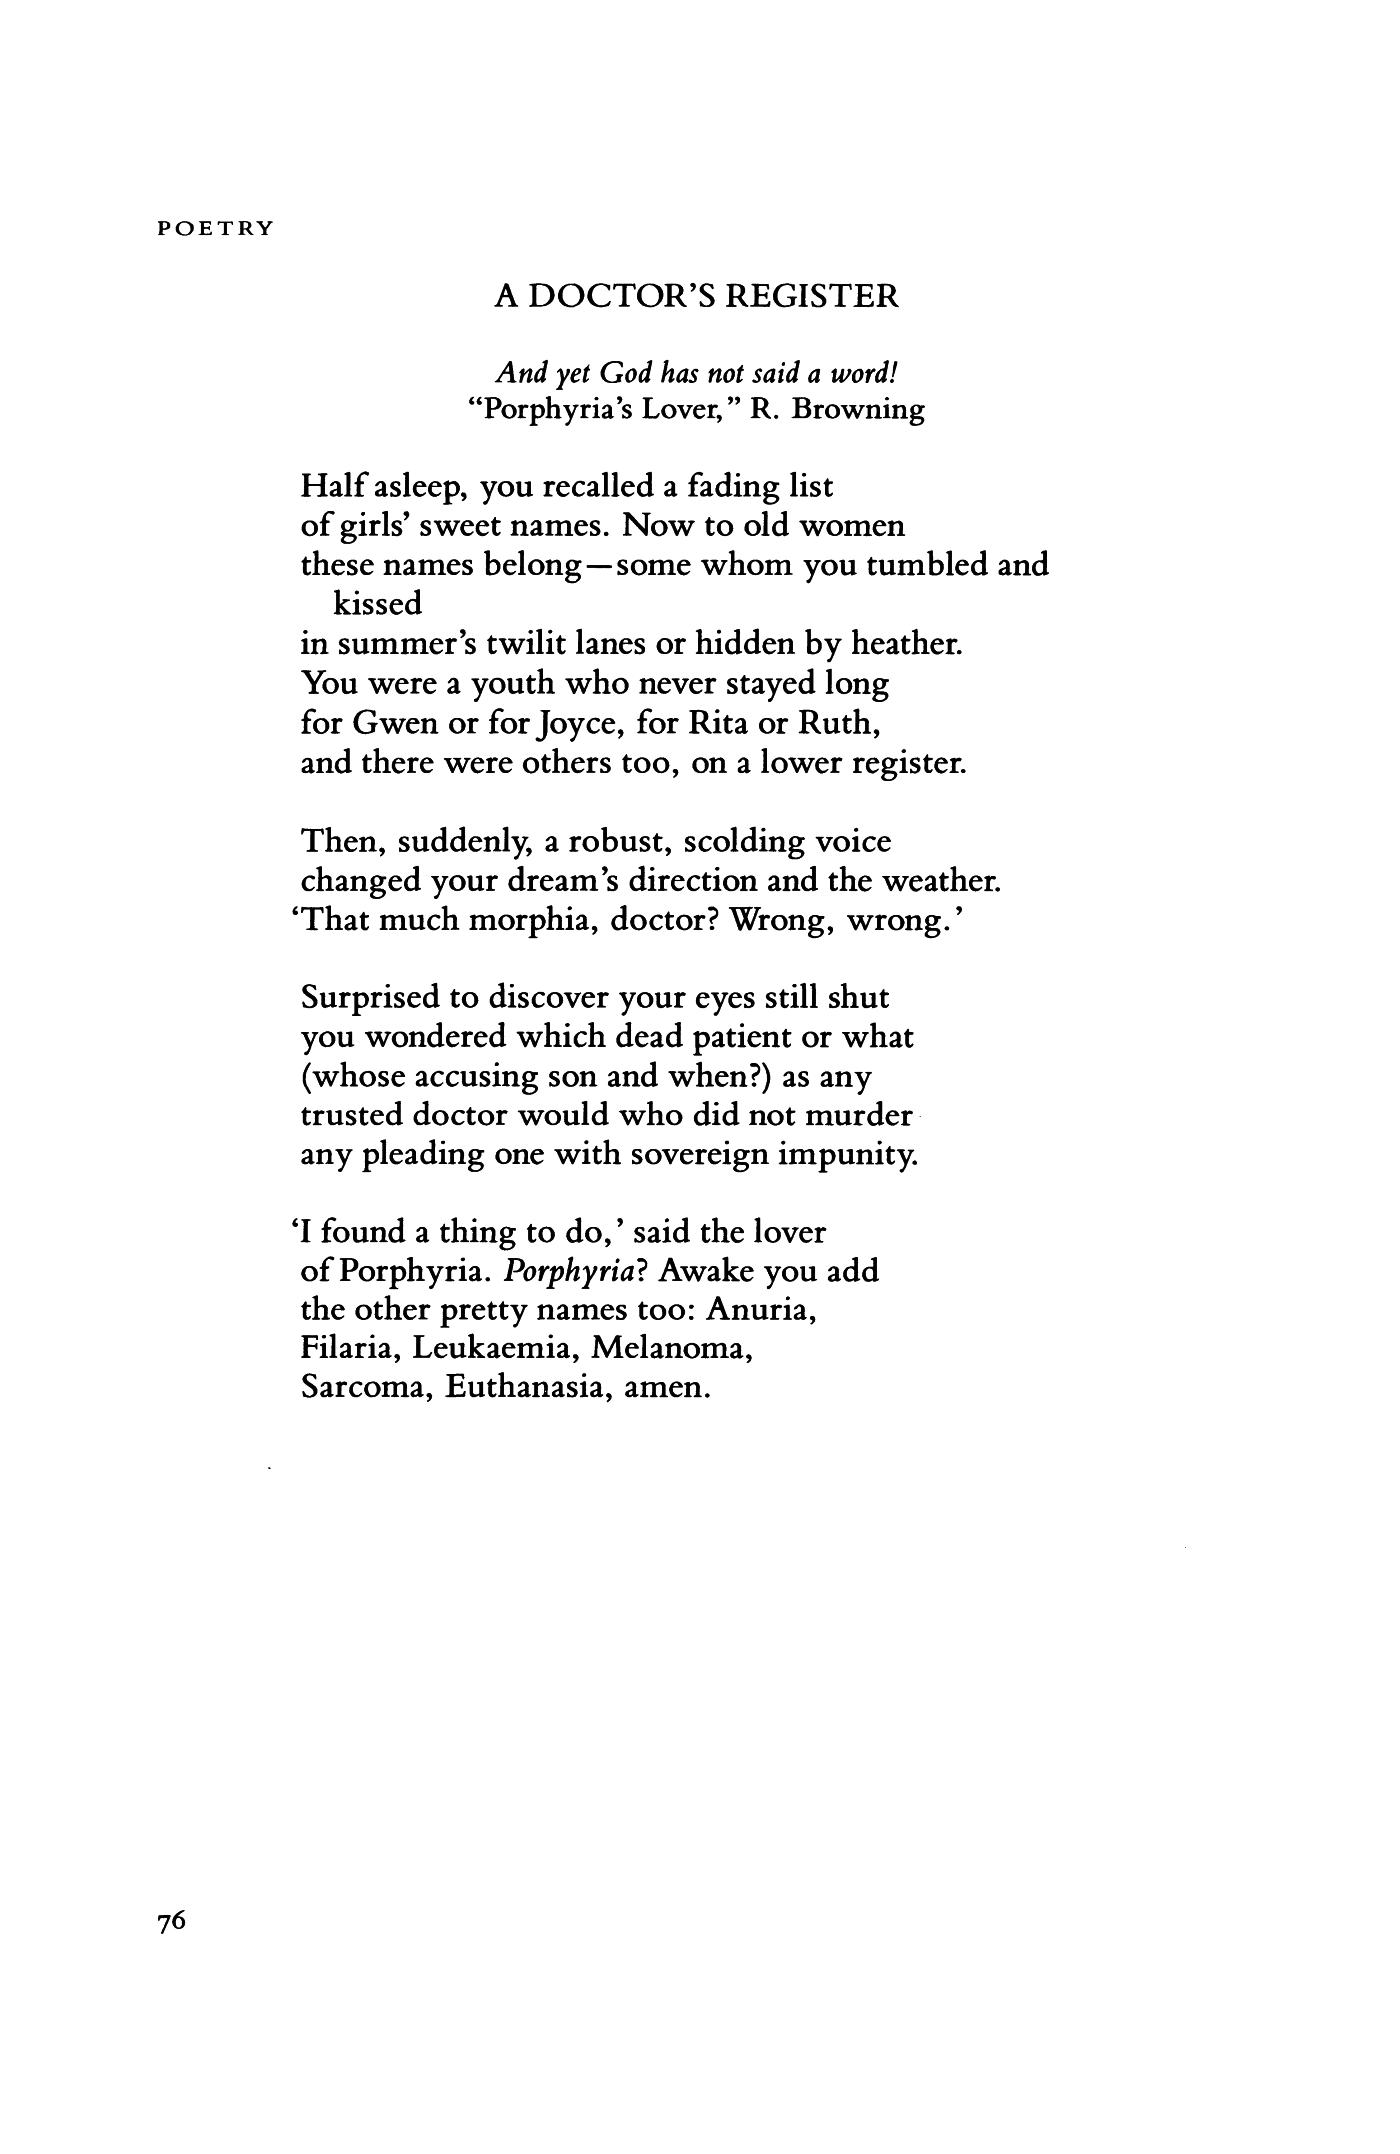 euthanasia poem